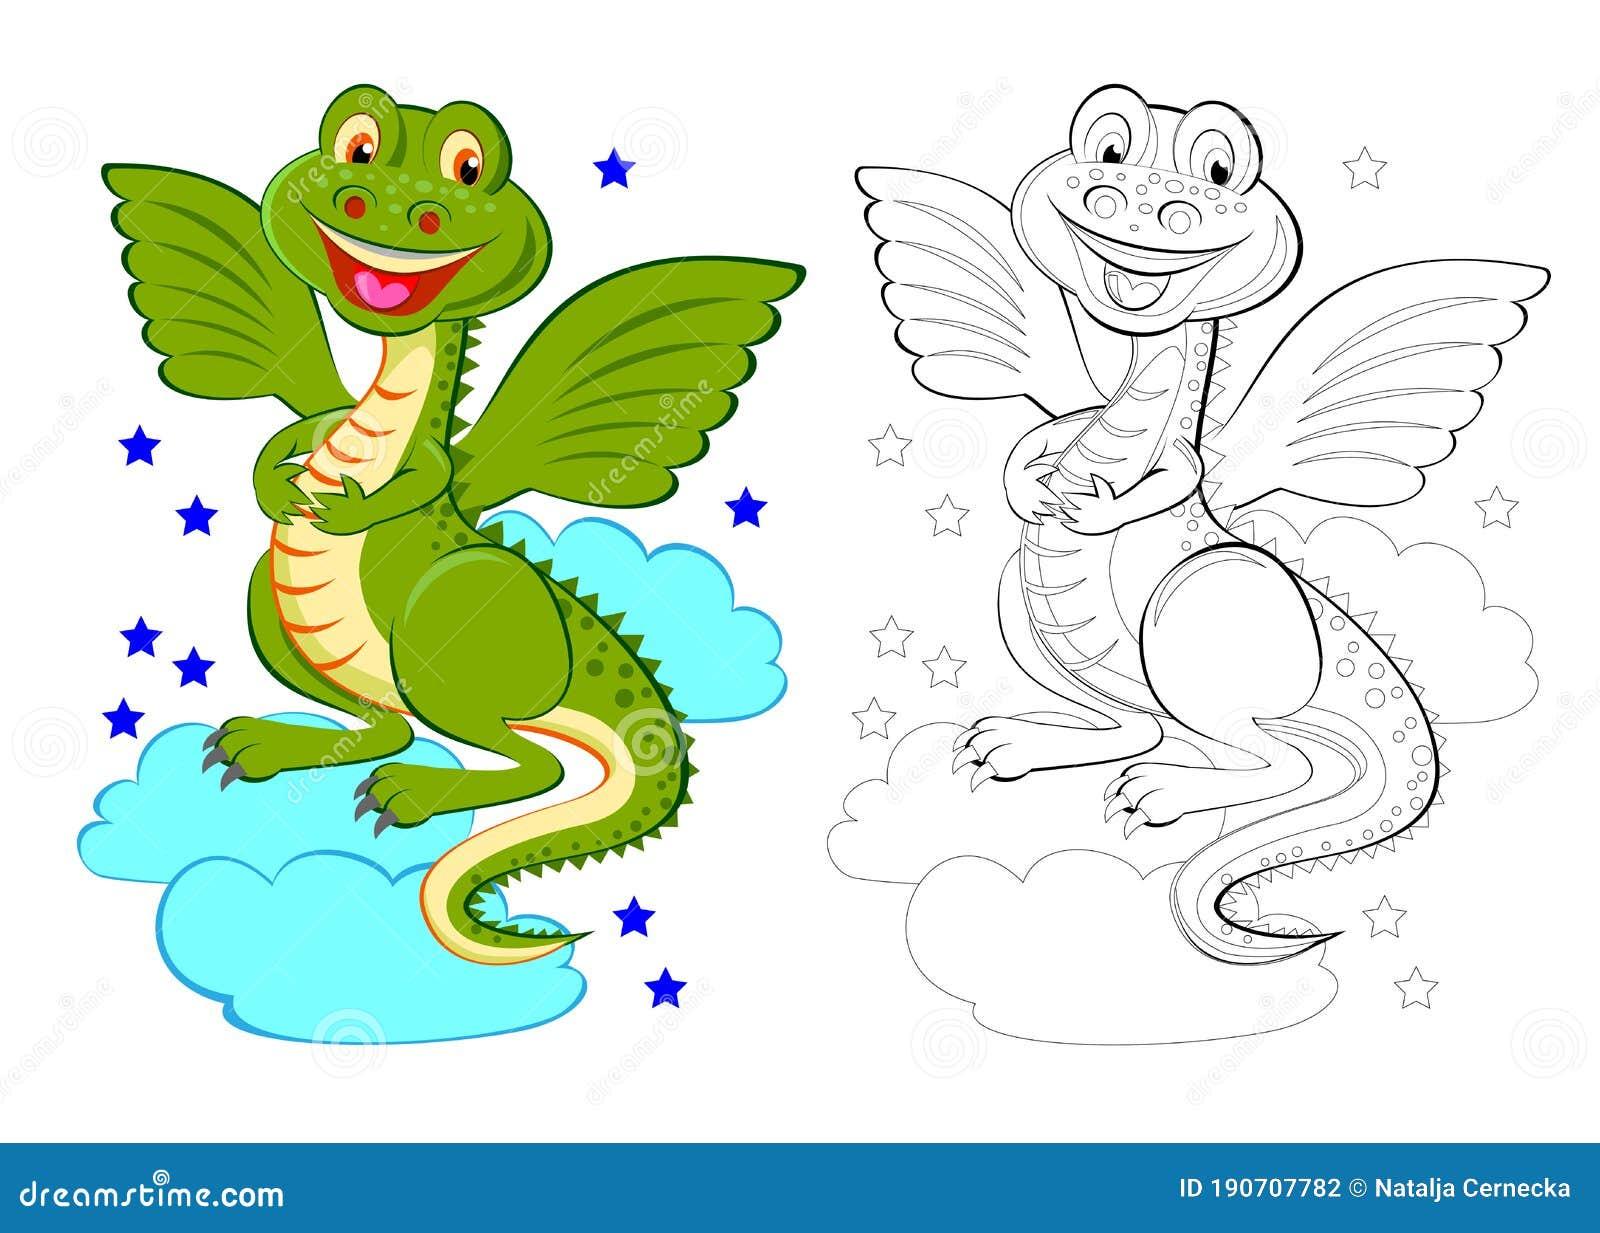 Xenosaurus Stock Illustrations – 14 Xenosaurus Stock Illustrations, Vectors  & Clipart - Dreamstime